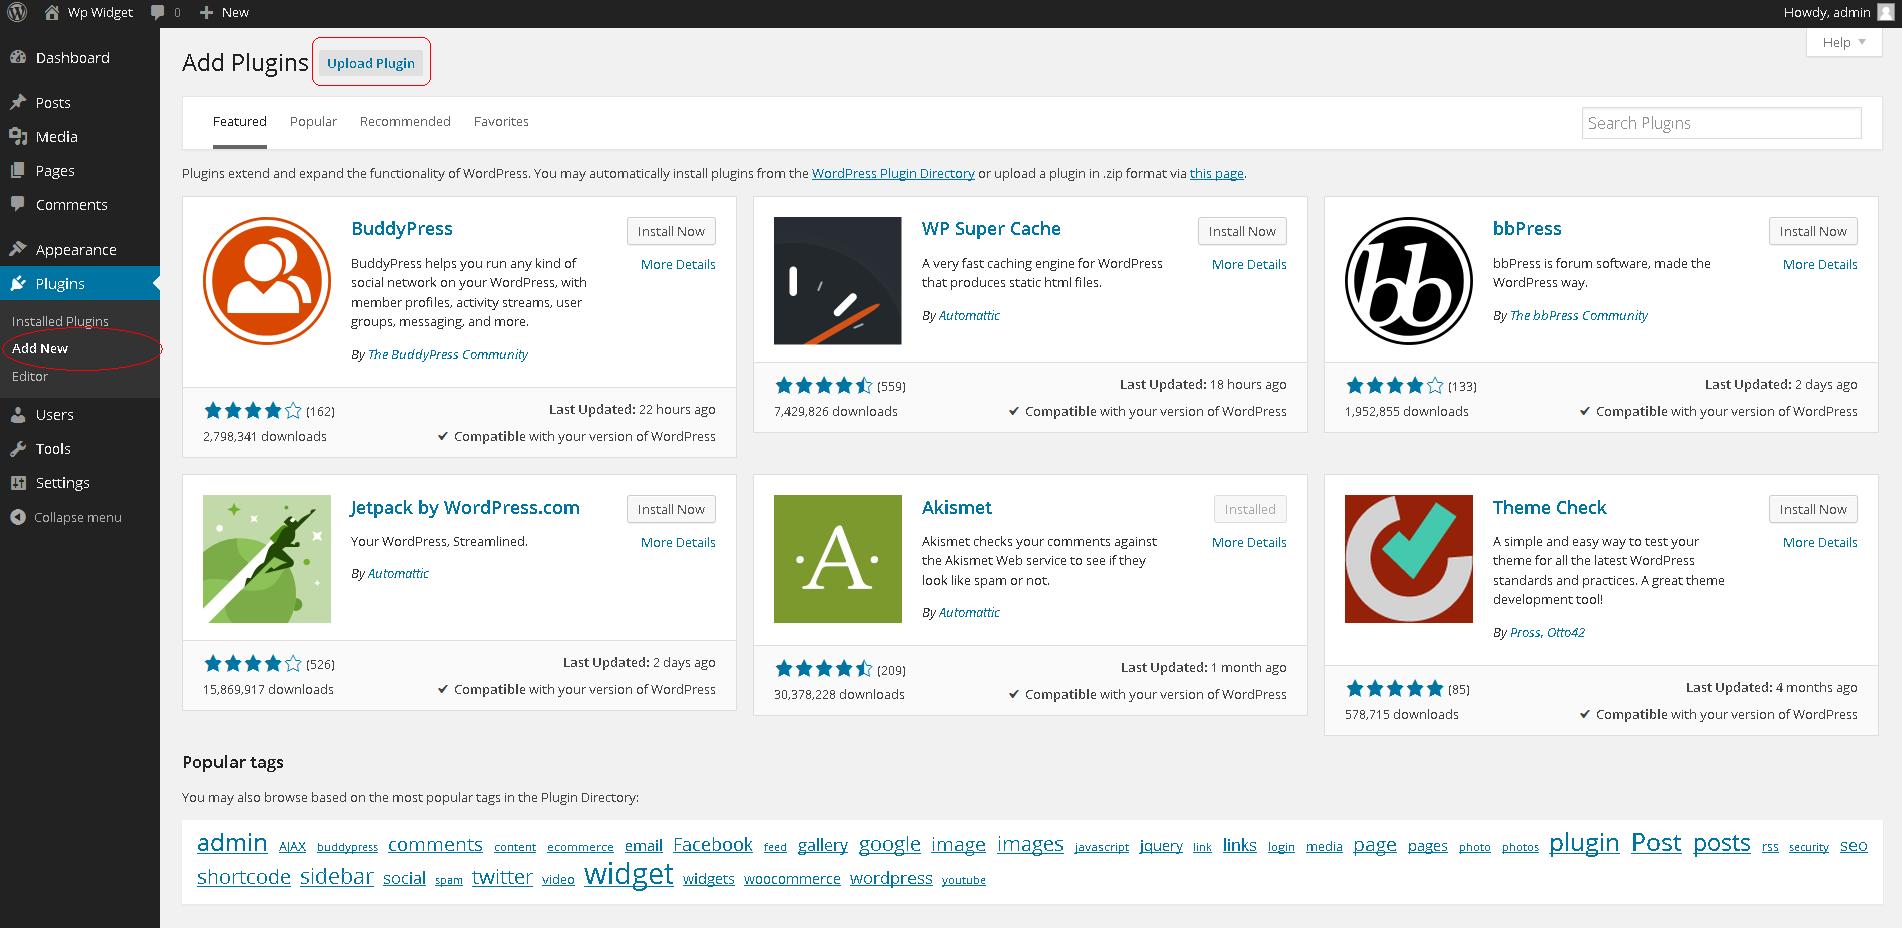 wp_plugins_add_new